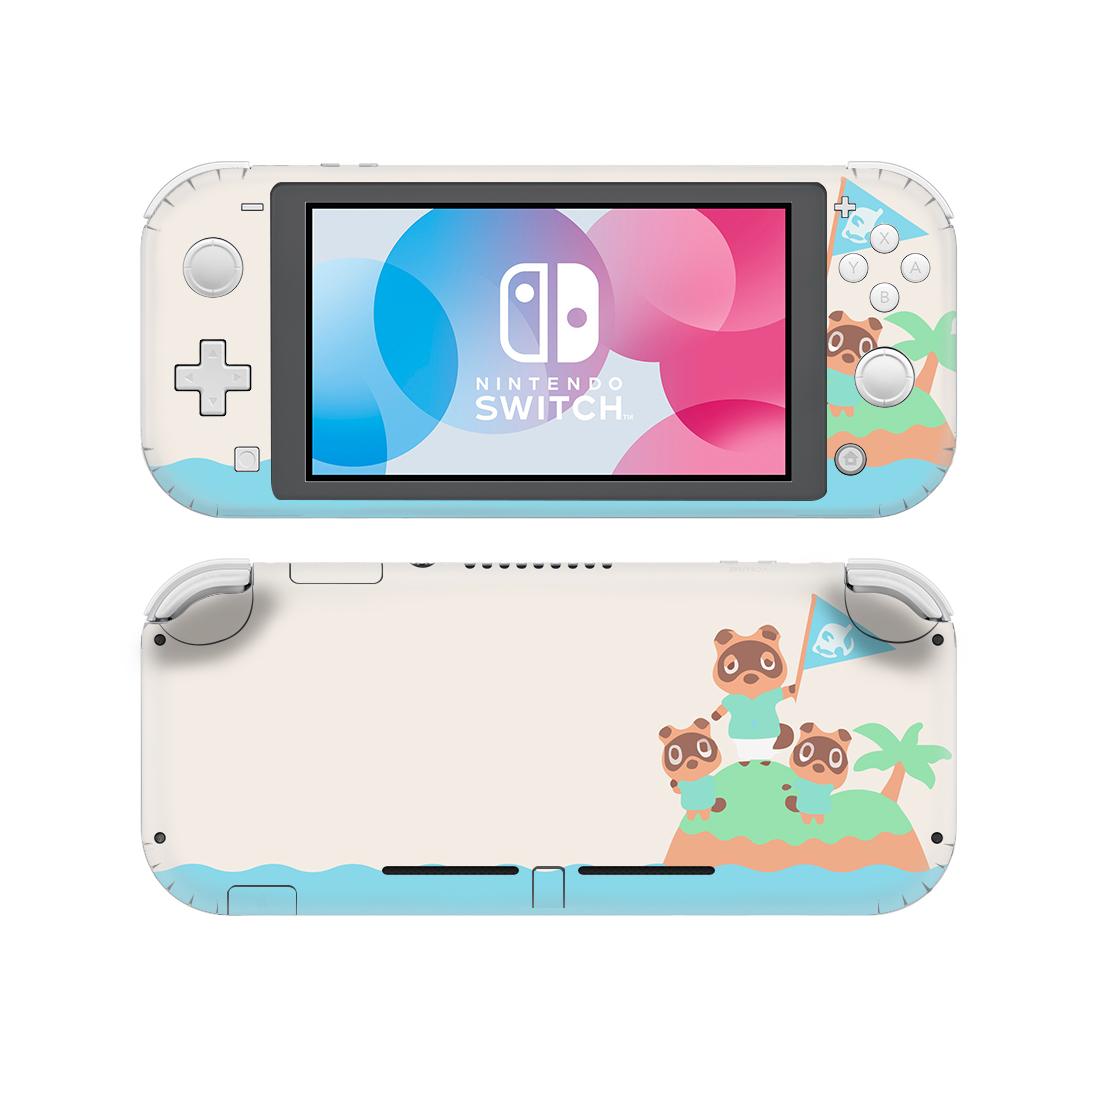 New Nintendo Switch Animal Crossing New Horizons Vinyl Skin Sold